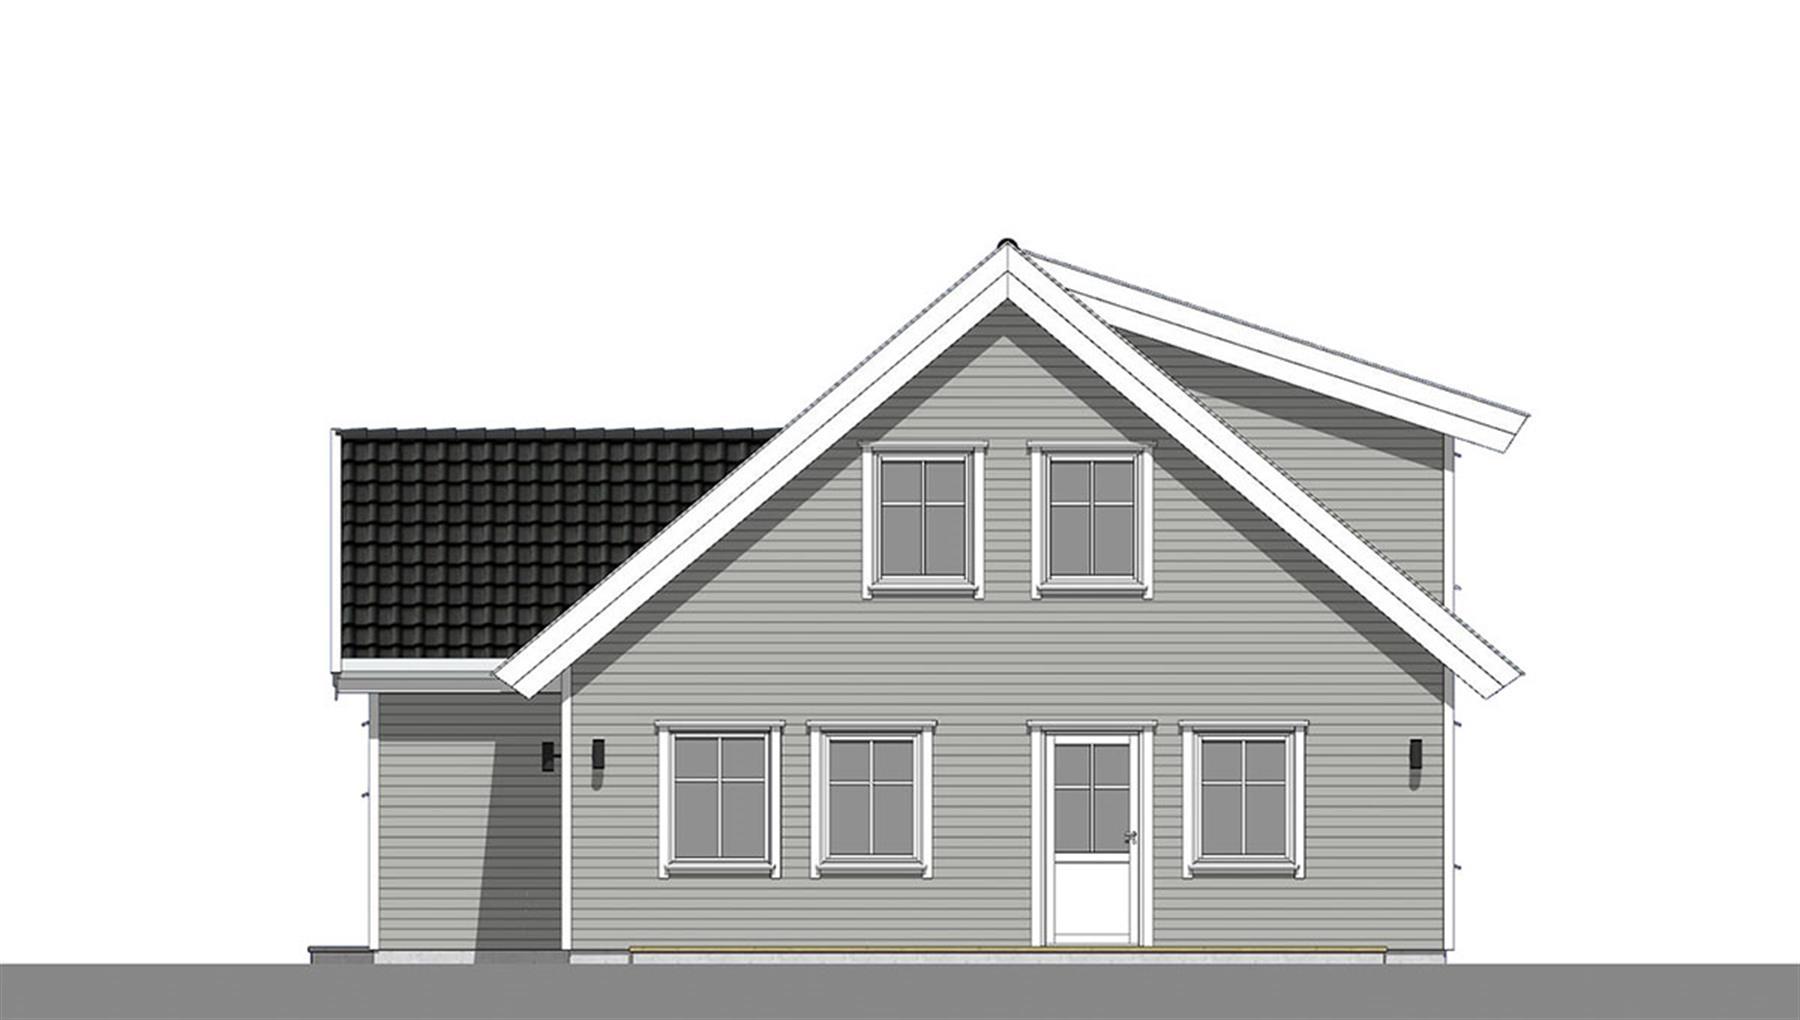 Sildemåke fasade 2